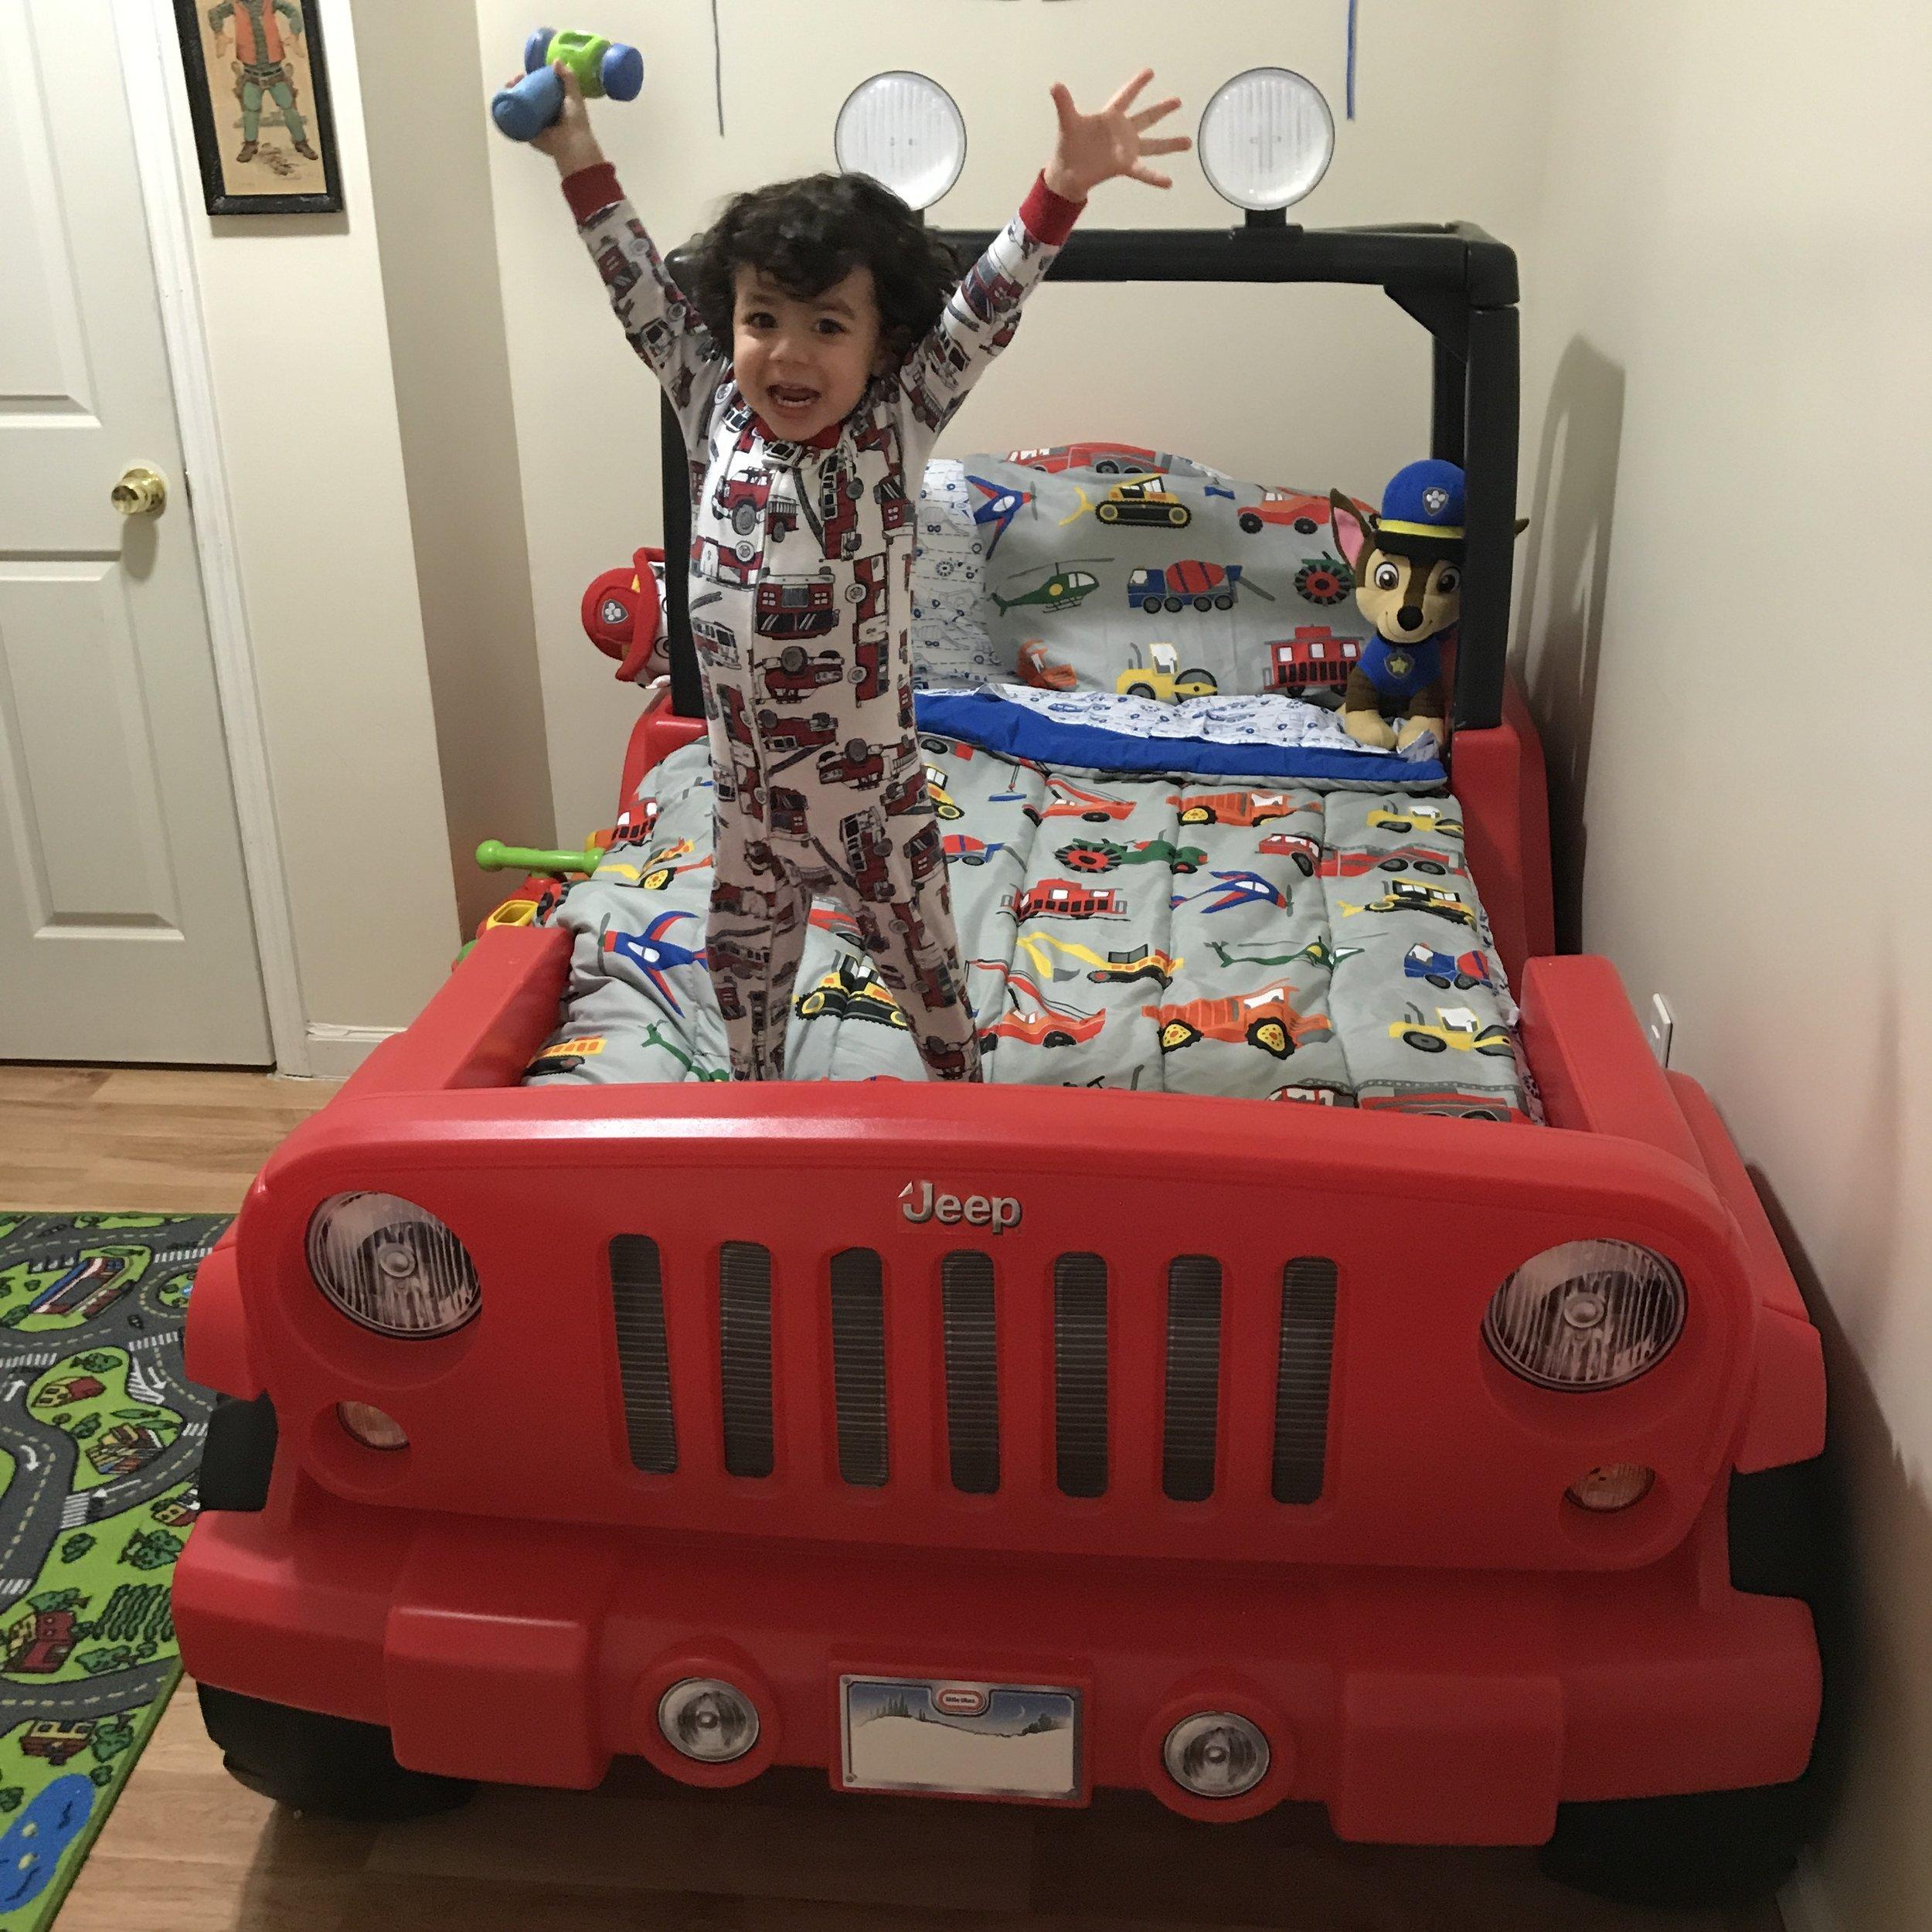 Jeep Toddler bedroom